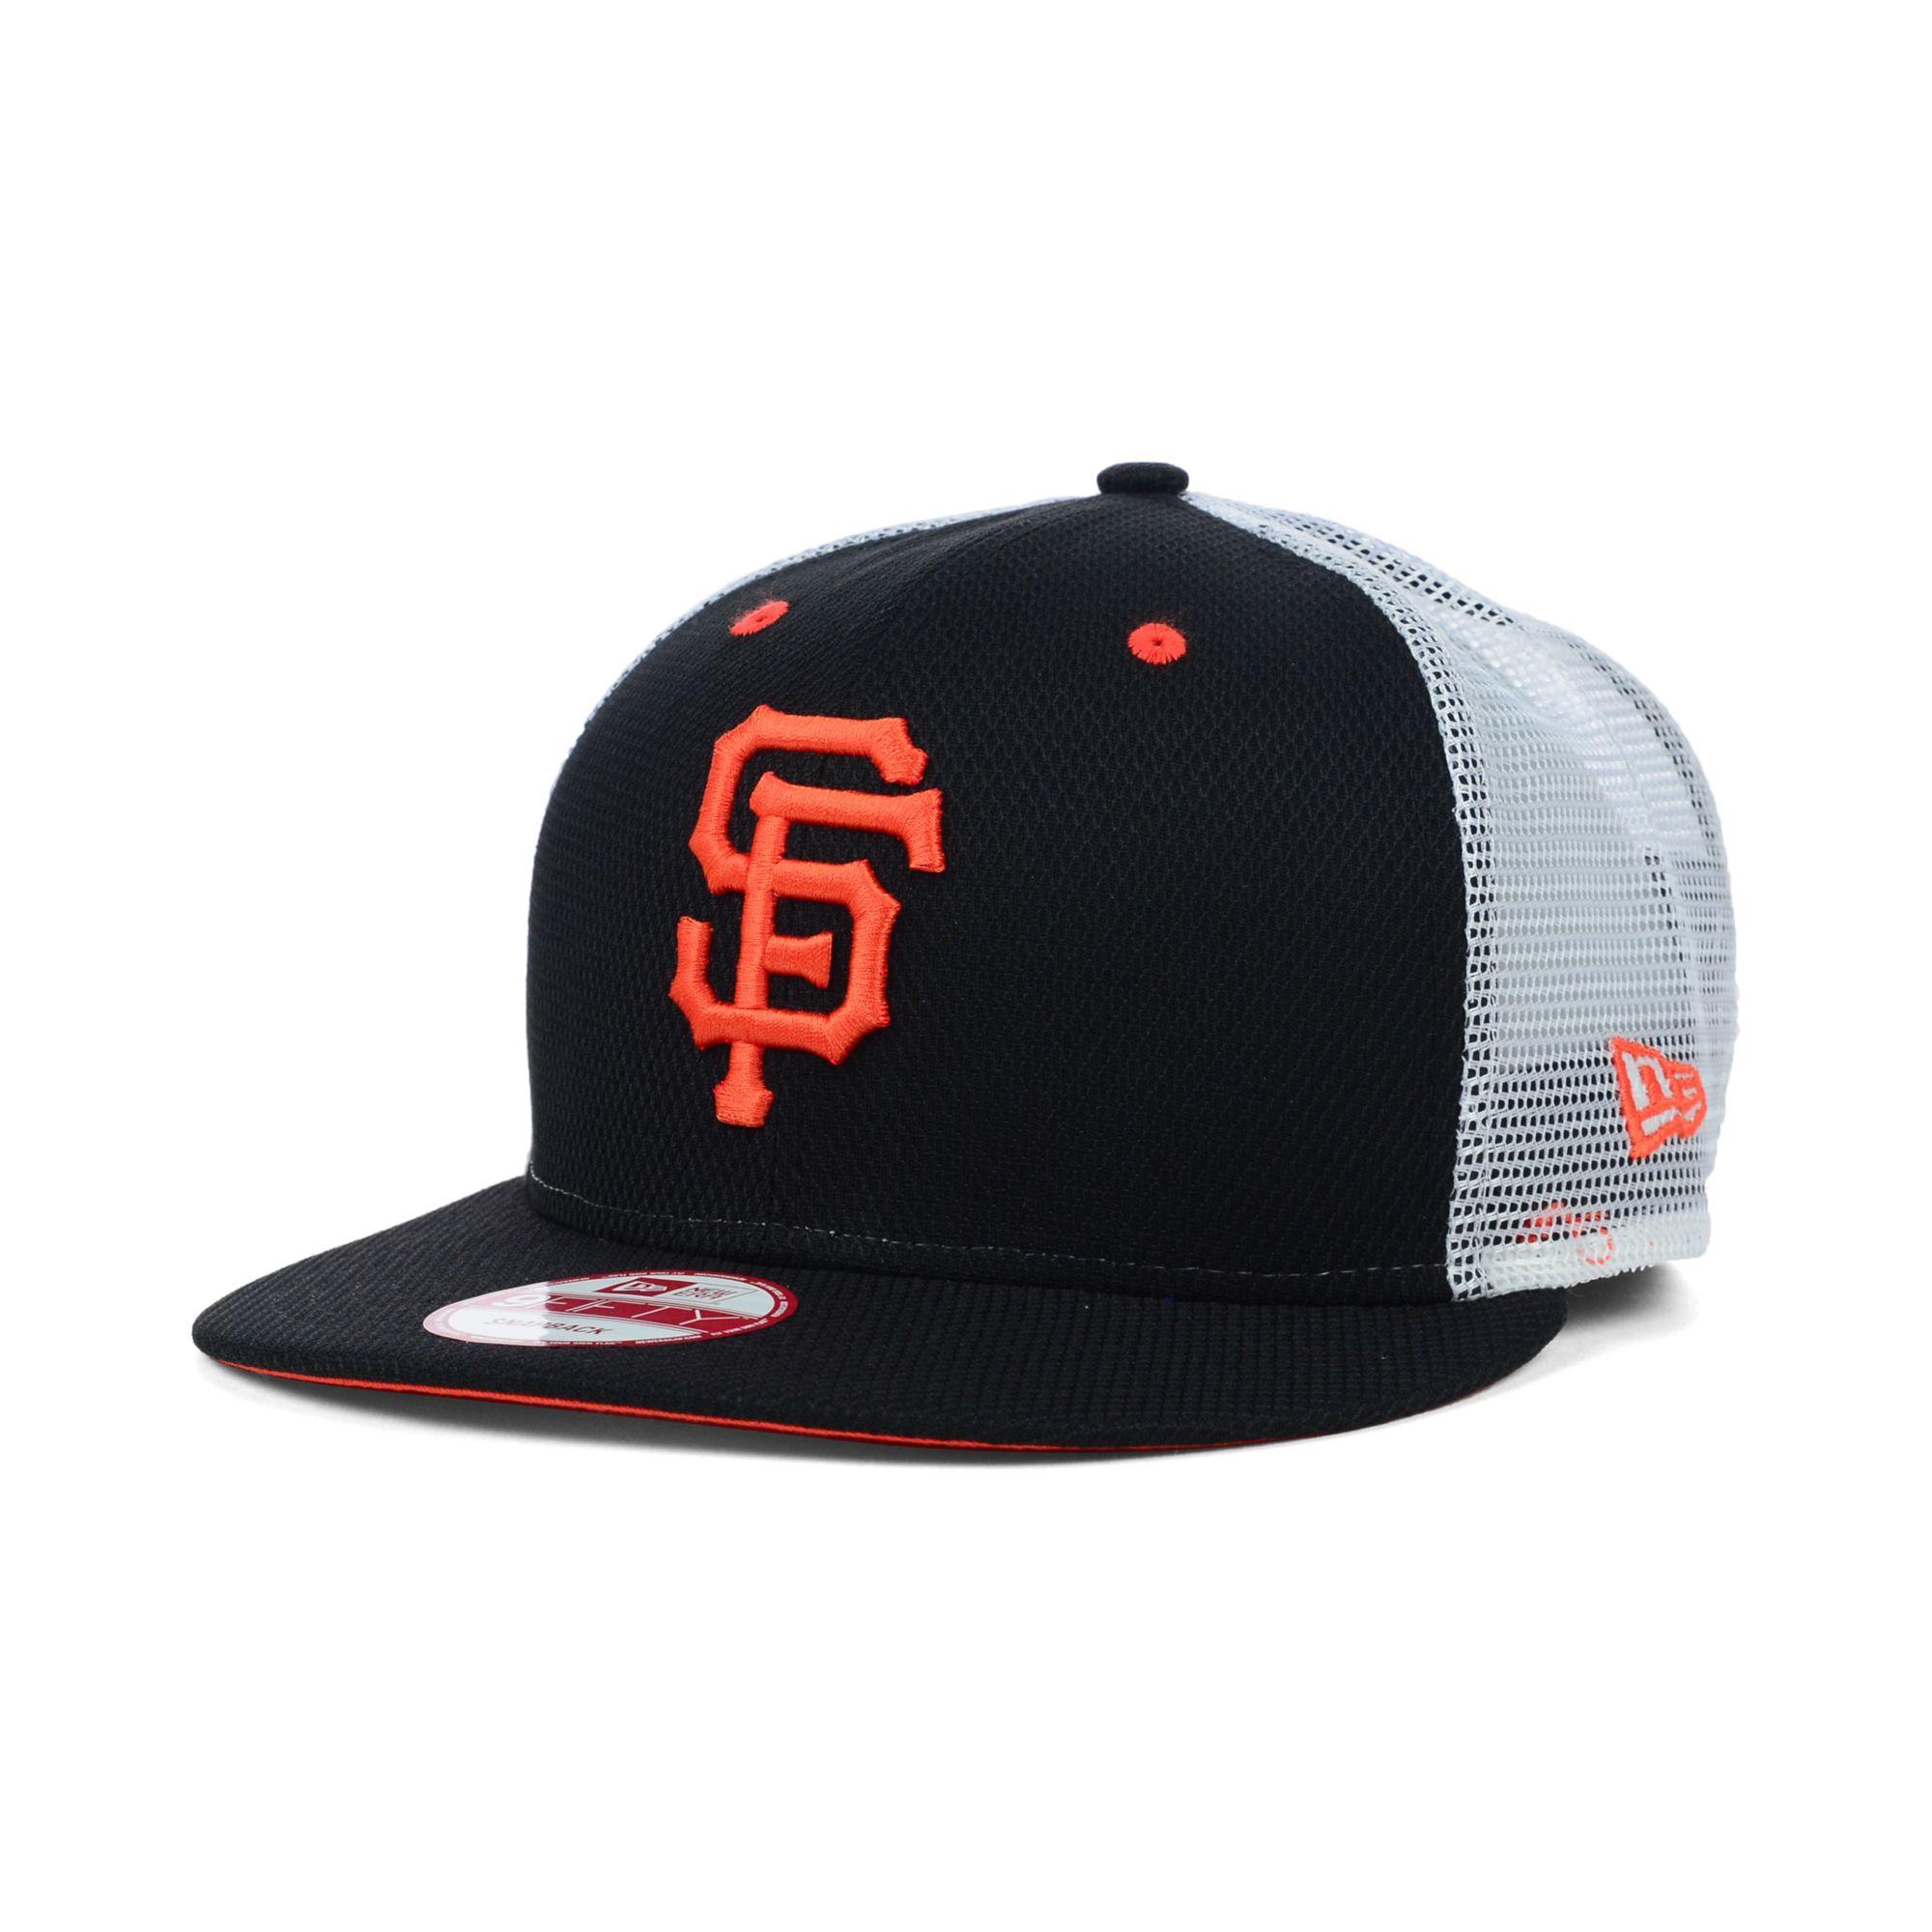 9099057b1 ... denmark era 59fifty san francisco giants baseball cap on field game.  loading zoom lyst ktz